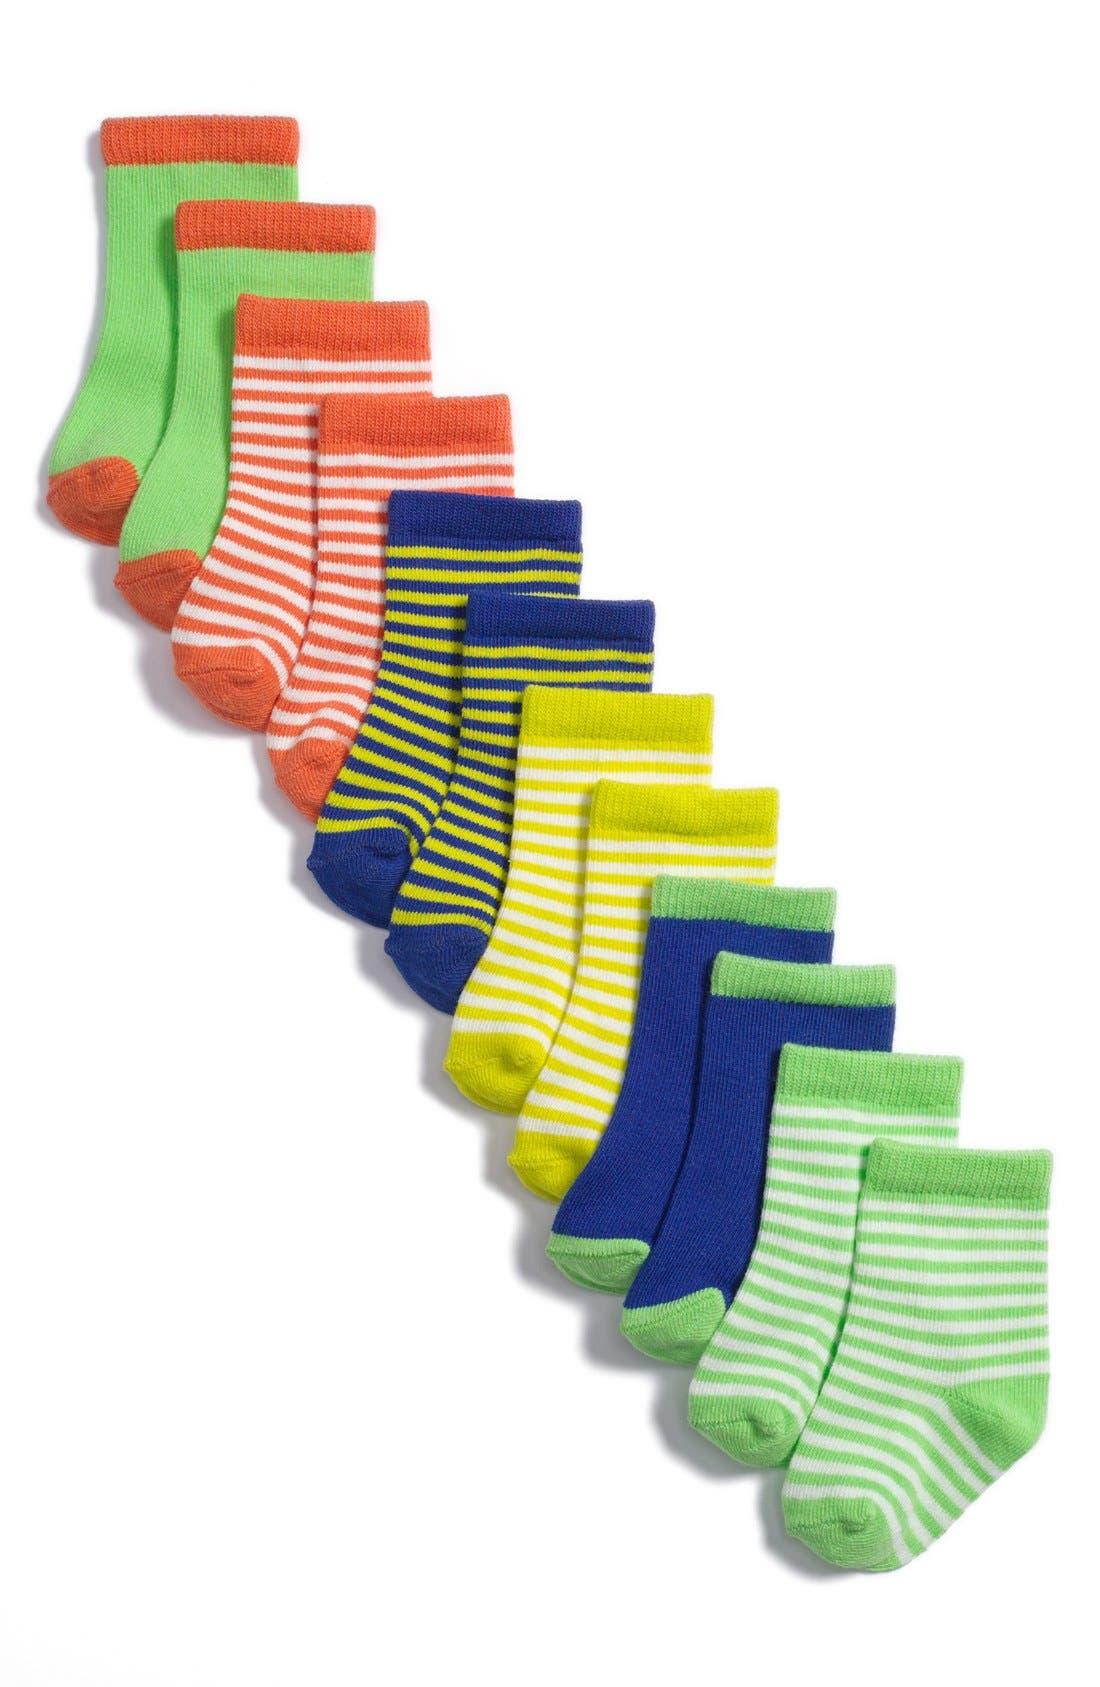 Main Image - Stem Baby Patterned Socks (6-Pack) (Baby Boys)